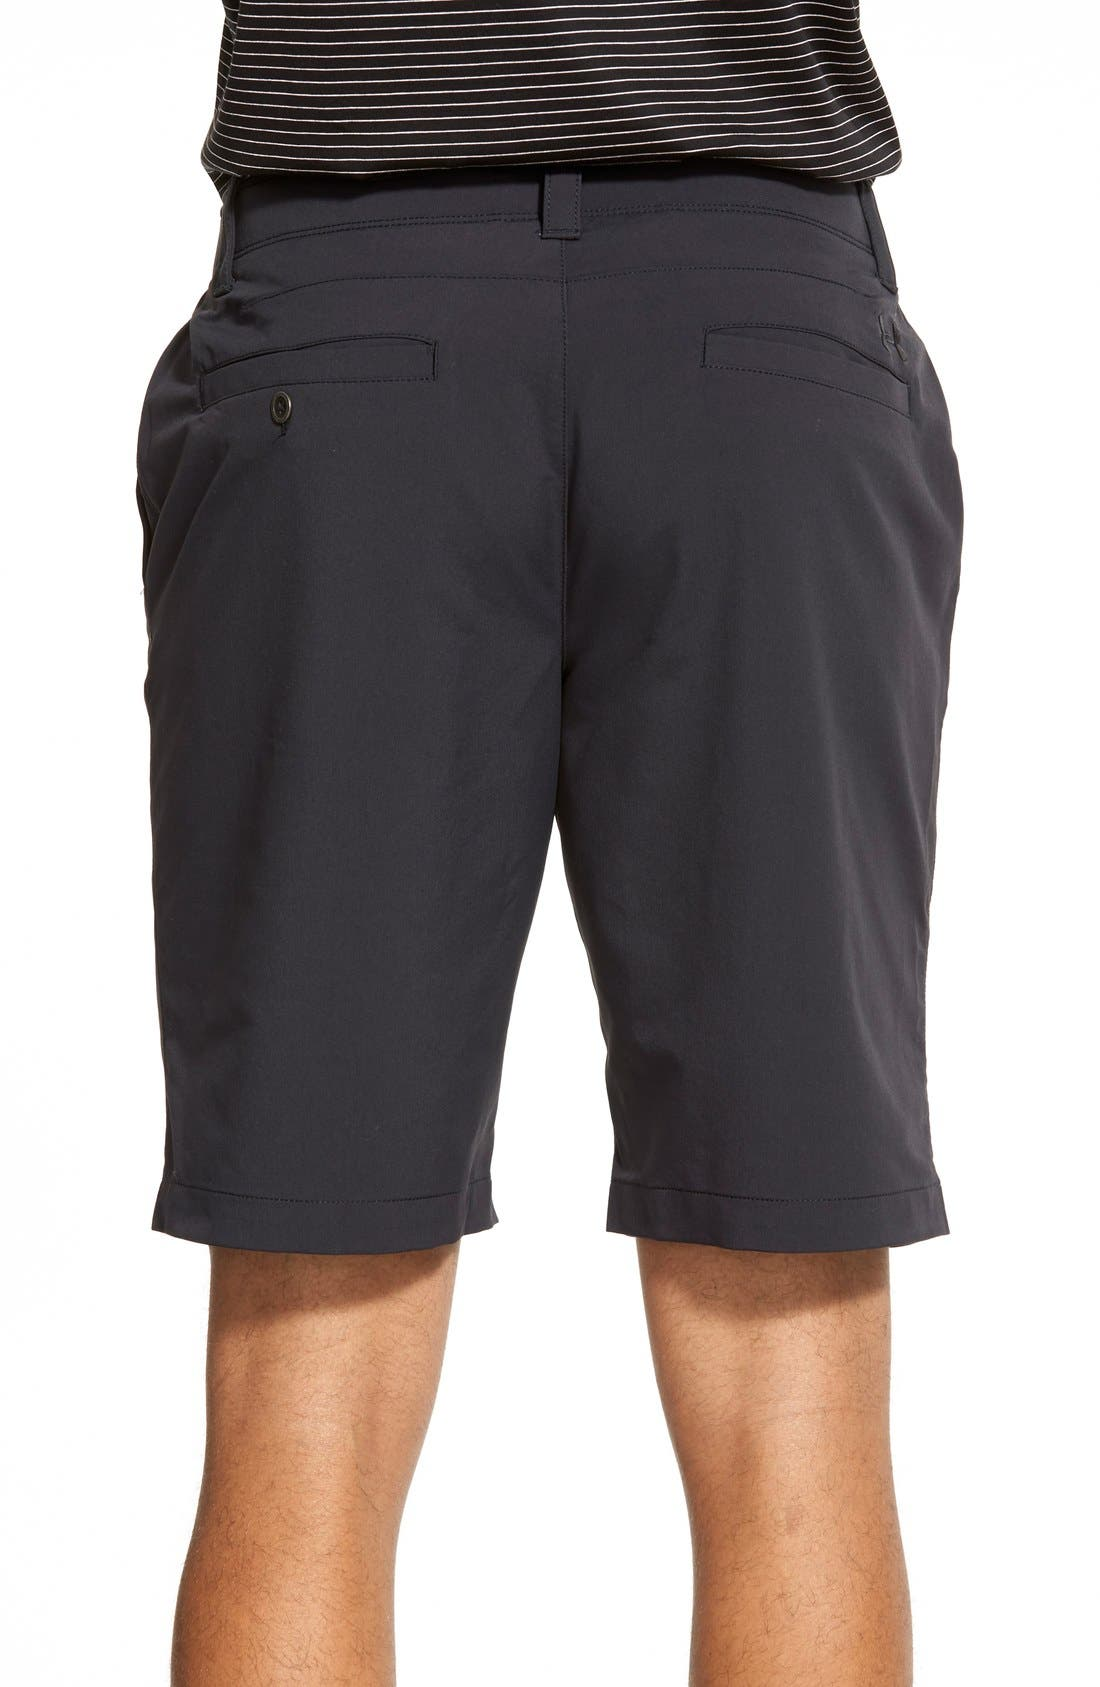 Alternate Image 2  - Under Armour 'Matchplay' Moisture Wicking Golf Shorts